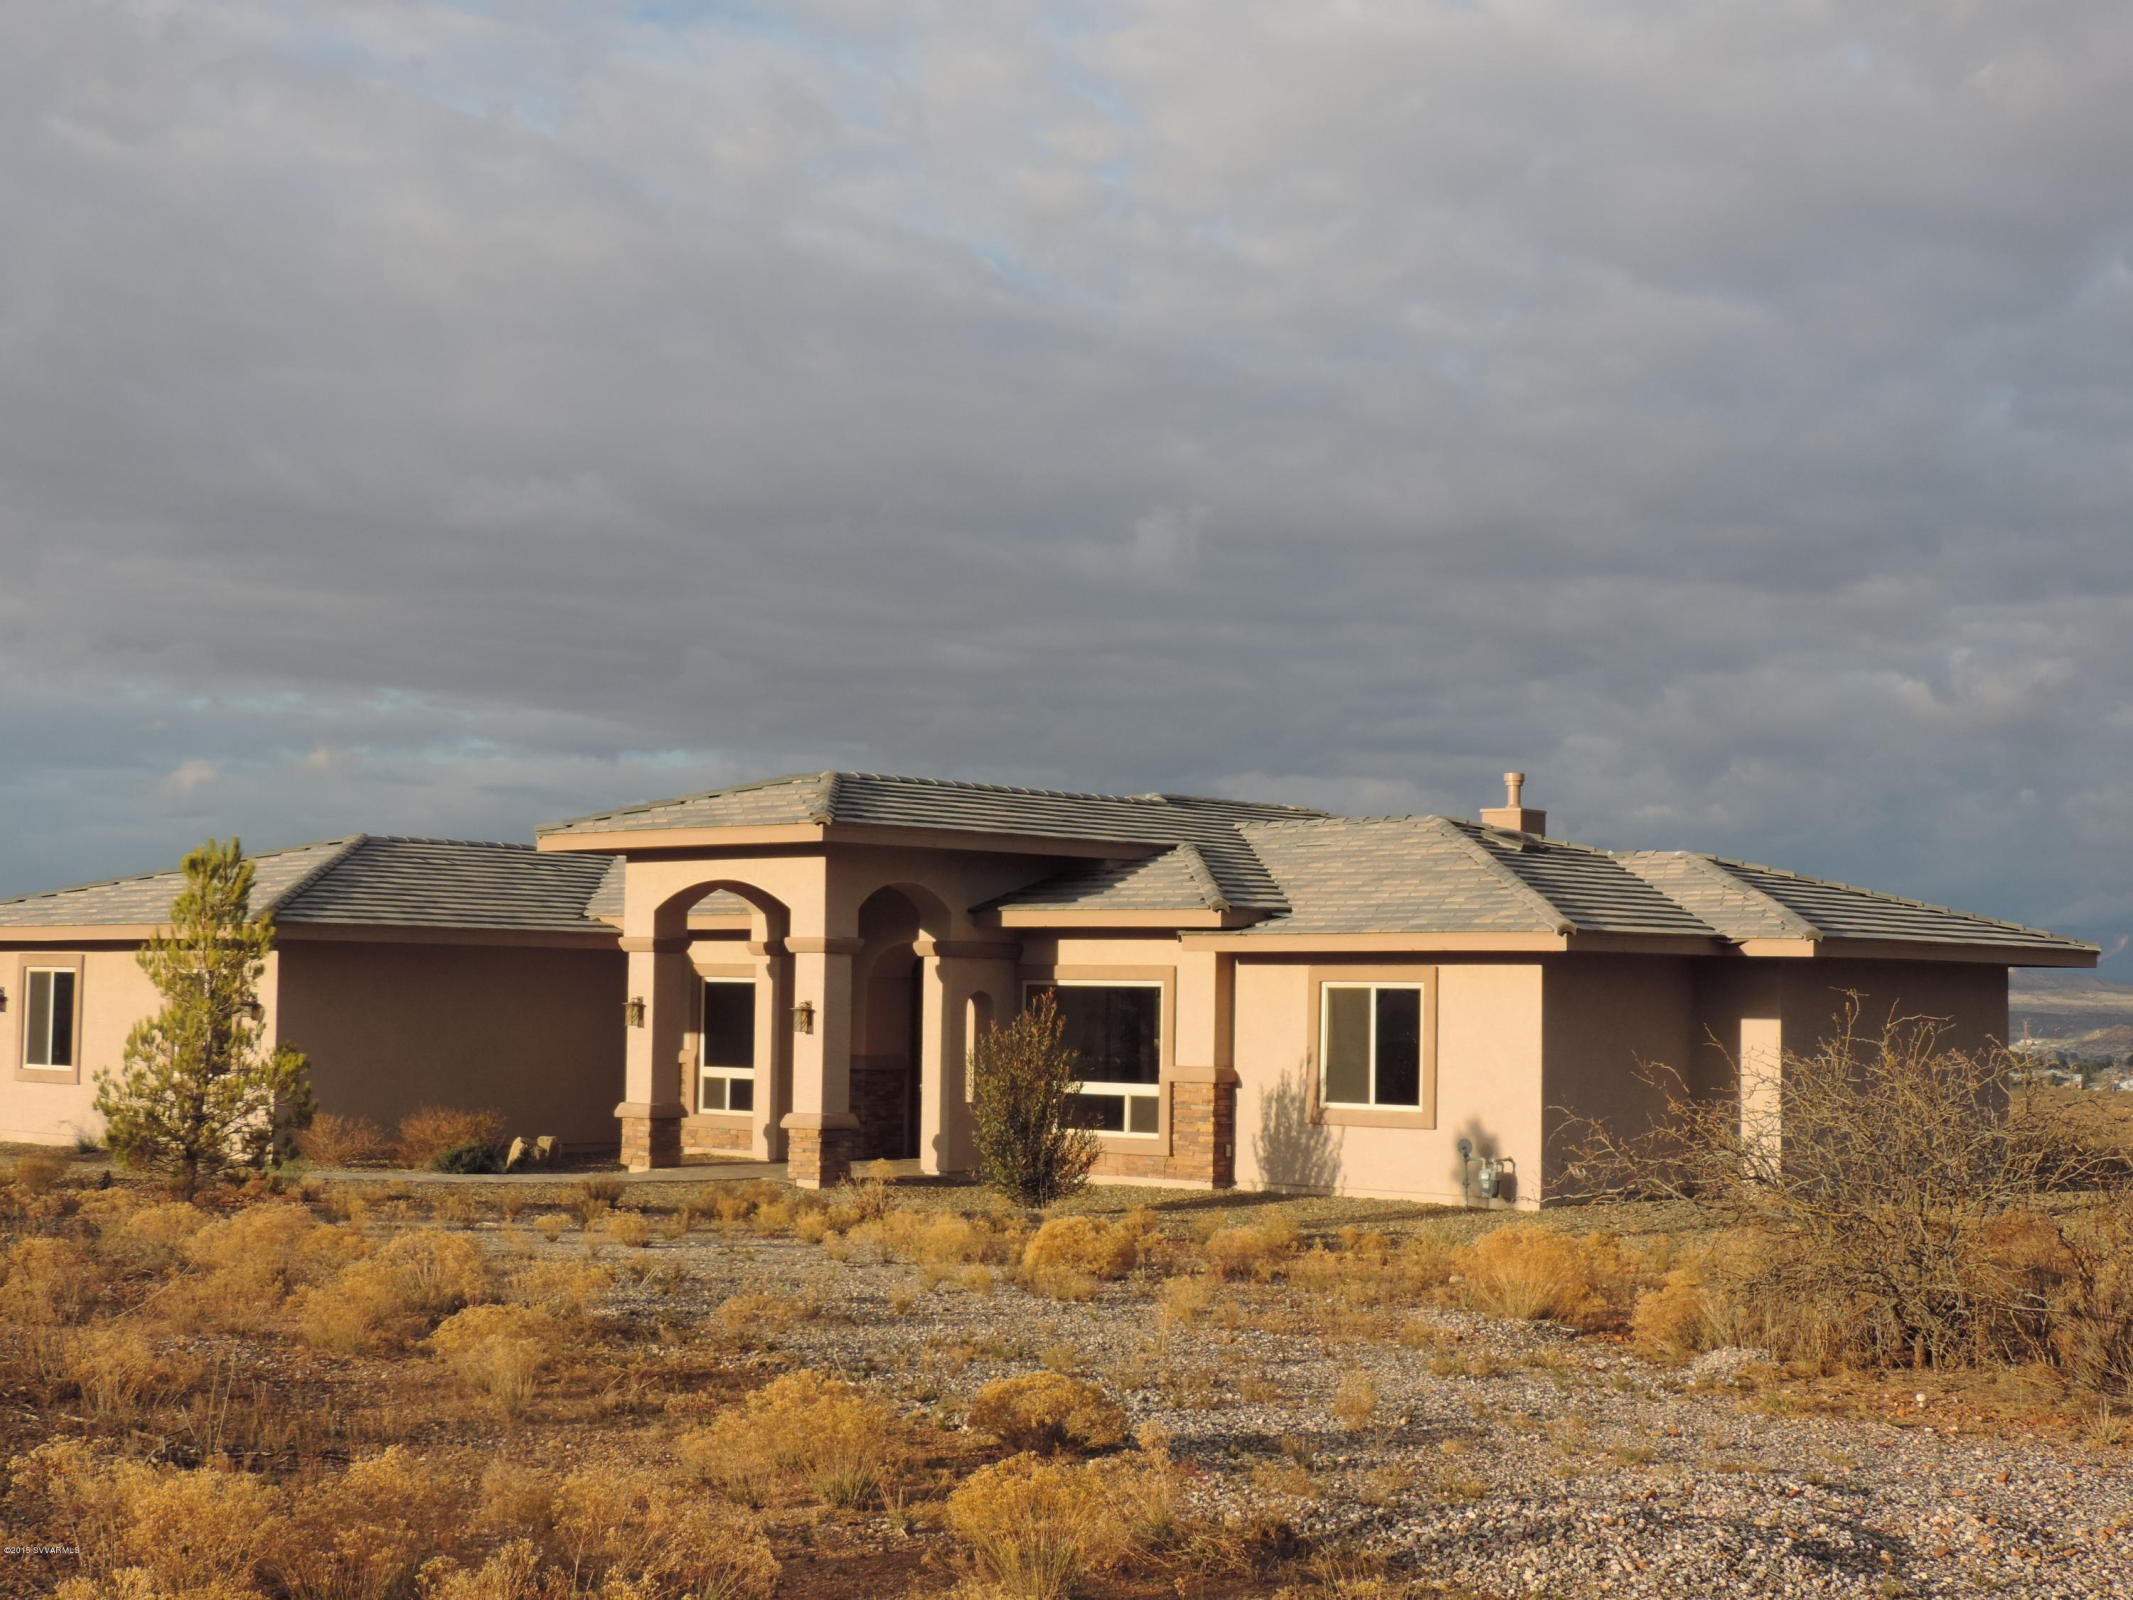 2805 QUAIL CANYON RD. , Cottonwood, Arizona 86326